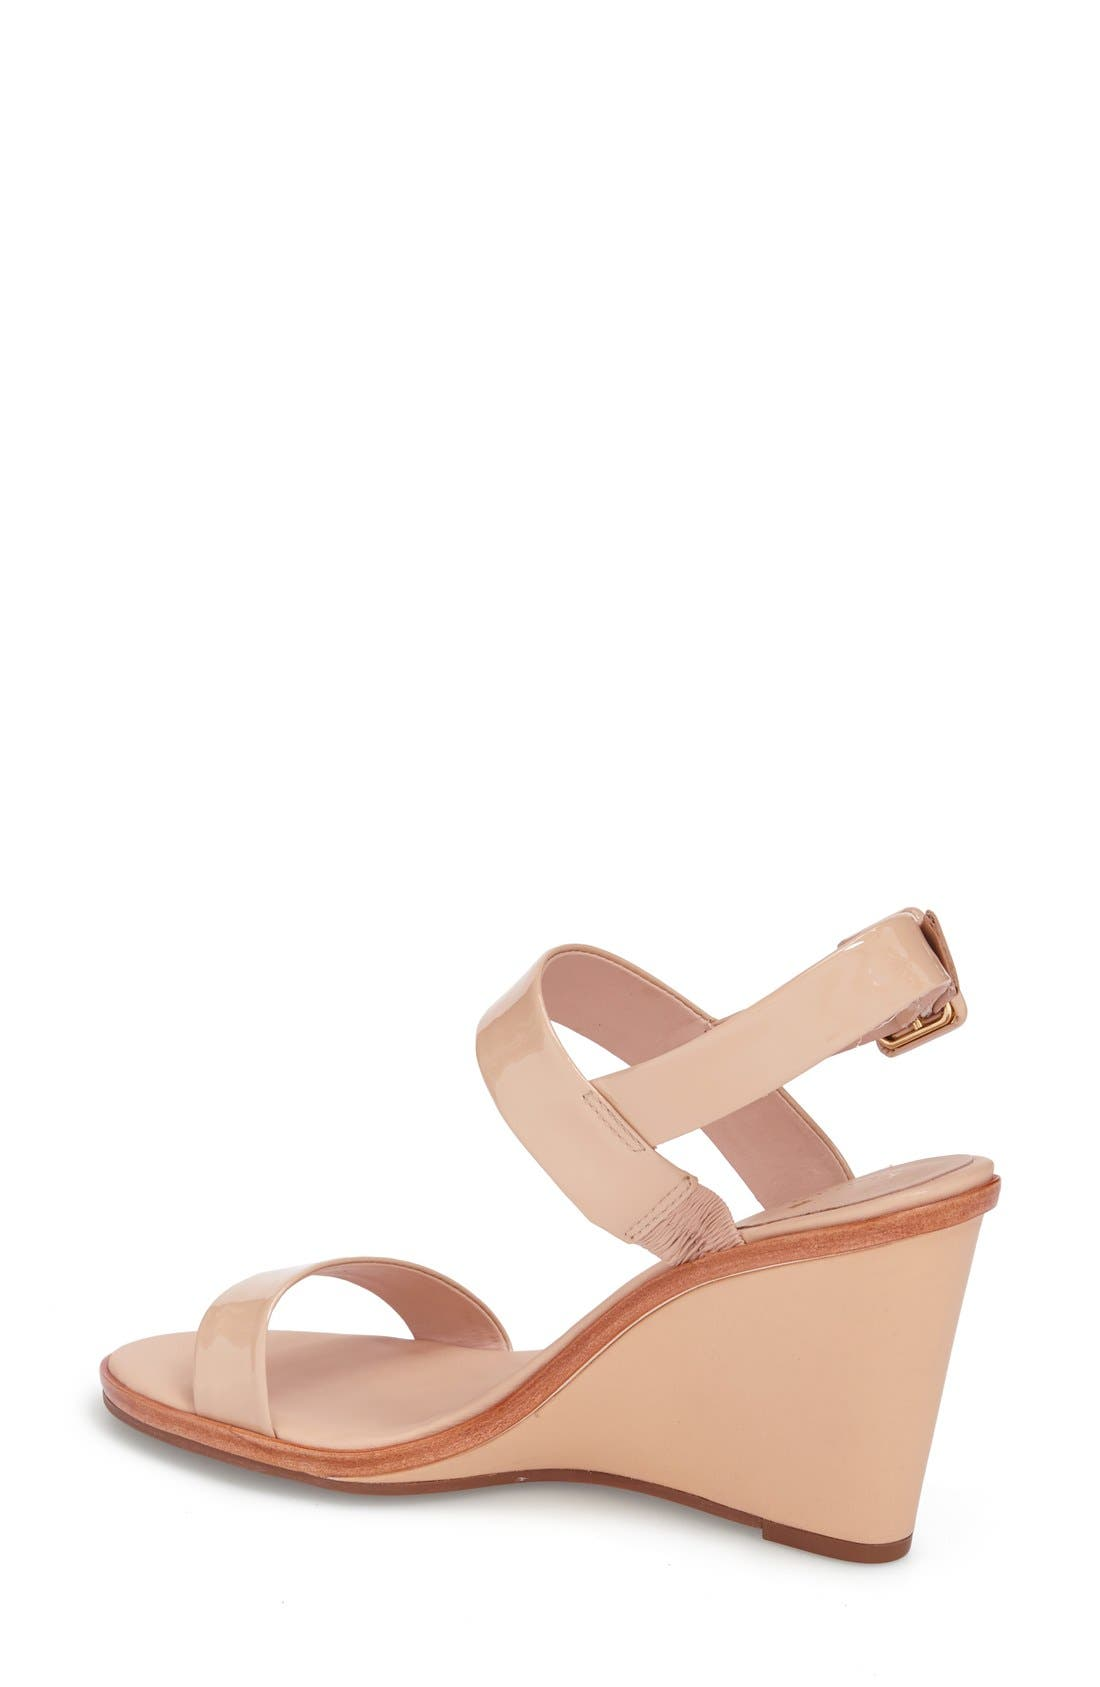 Alternate Image 2  - kate spade new york 'nice' sandal (Women)